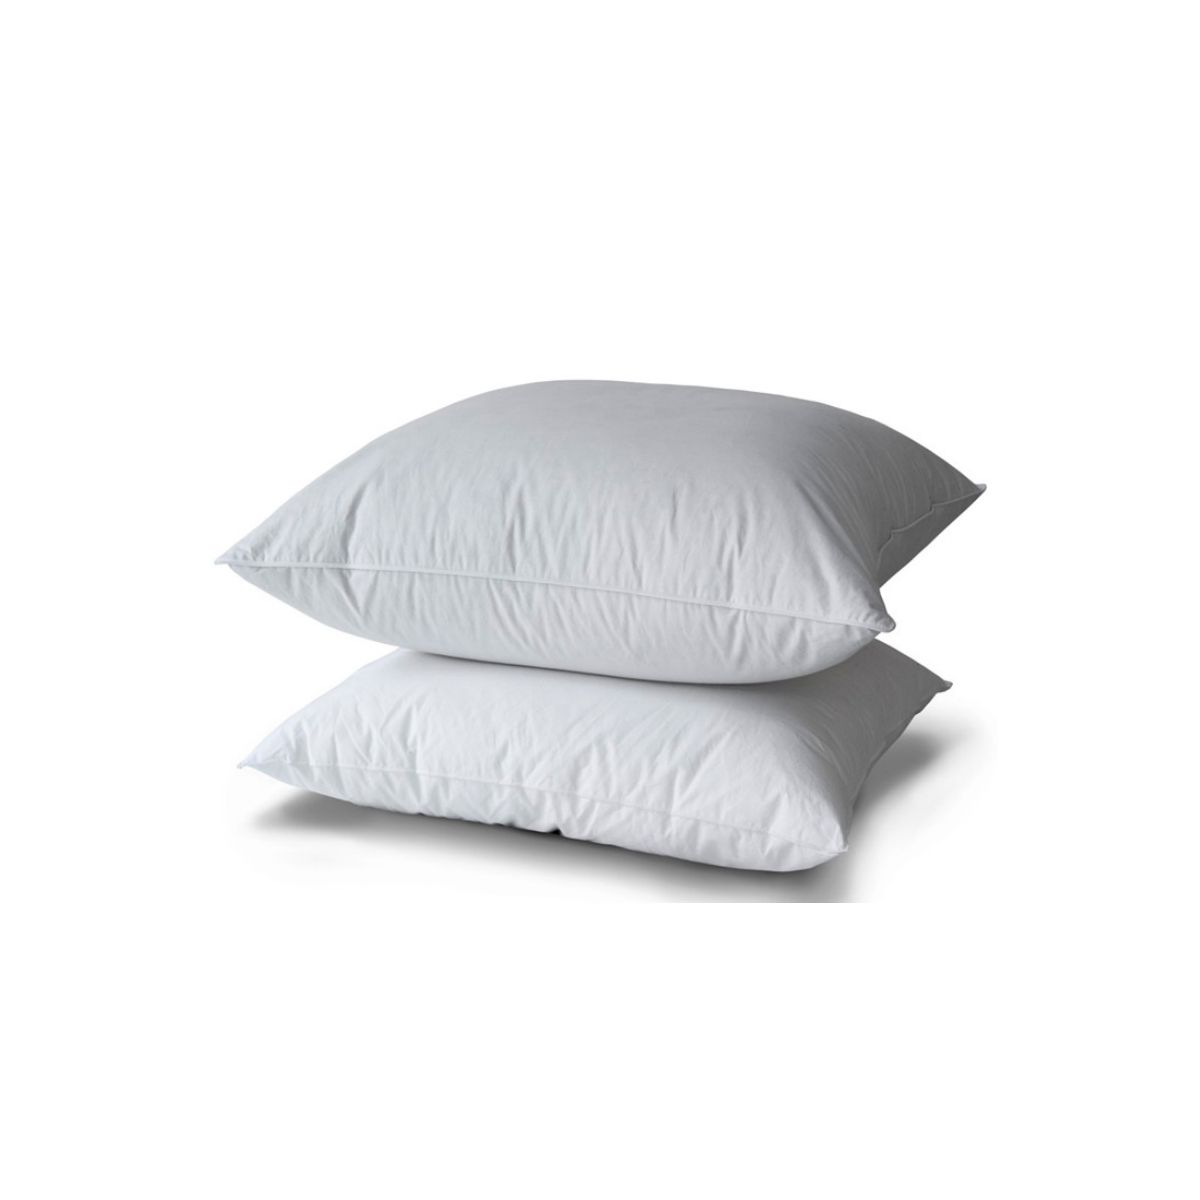 Pillow 10% Duvet Duck Ppb Piping White   Bed linen   Tradition des Vosges